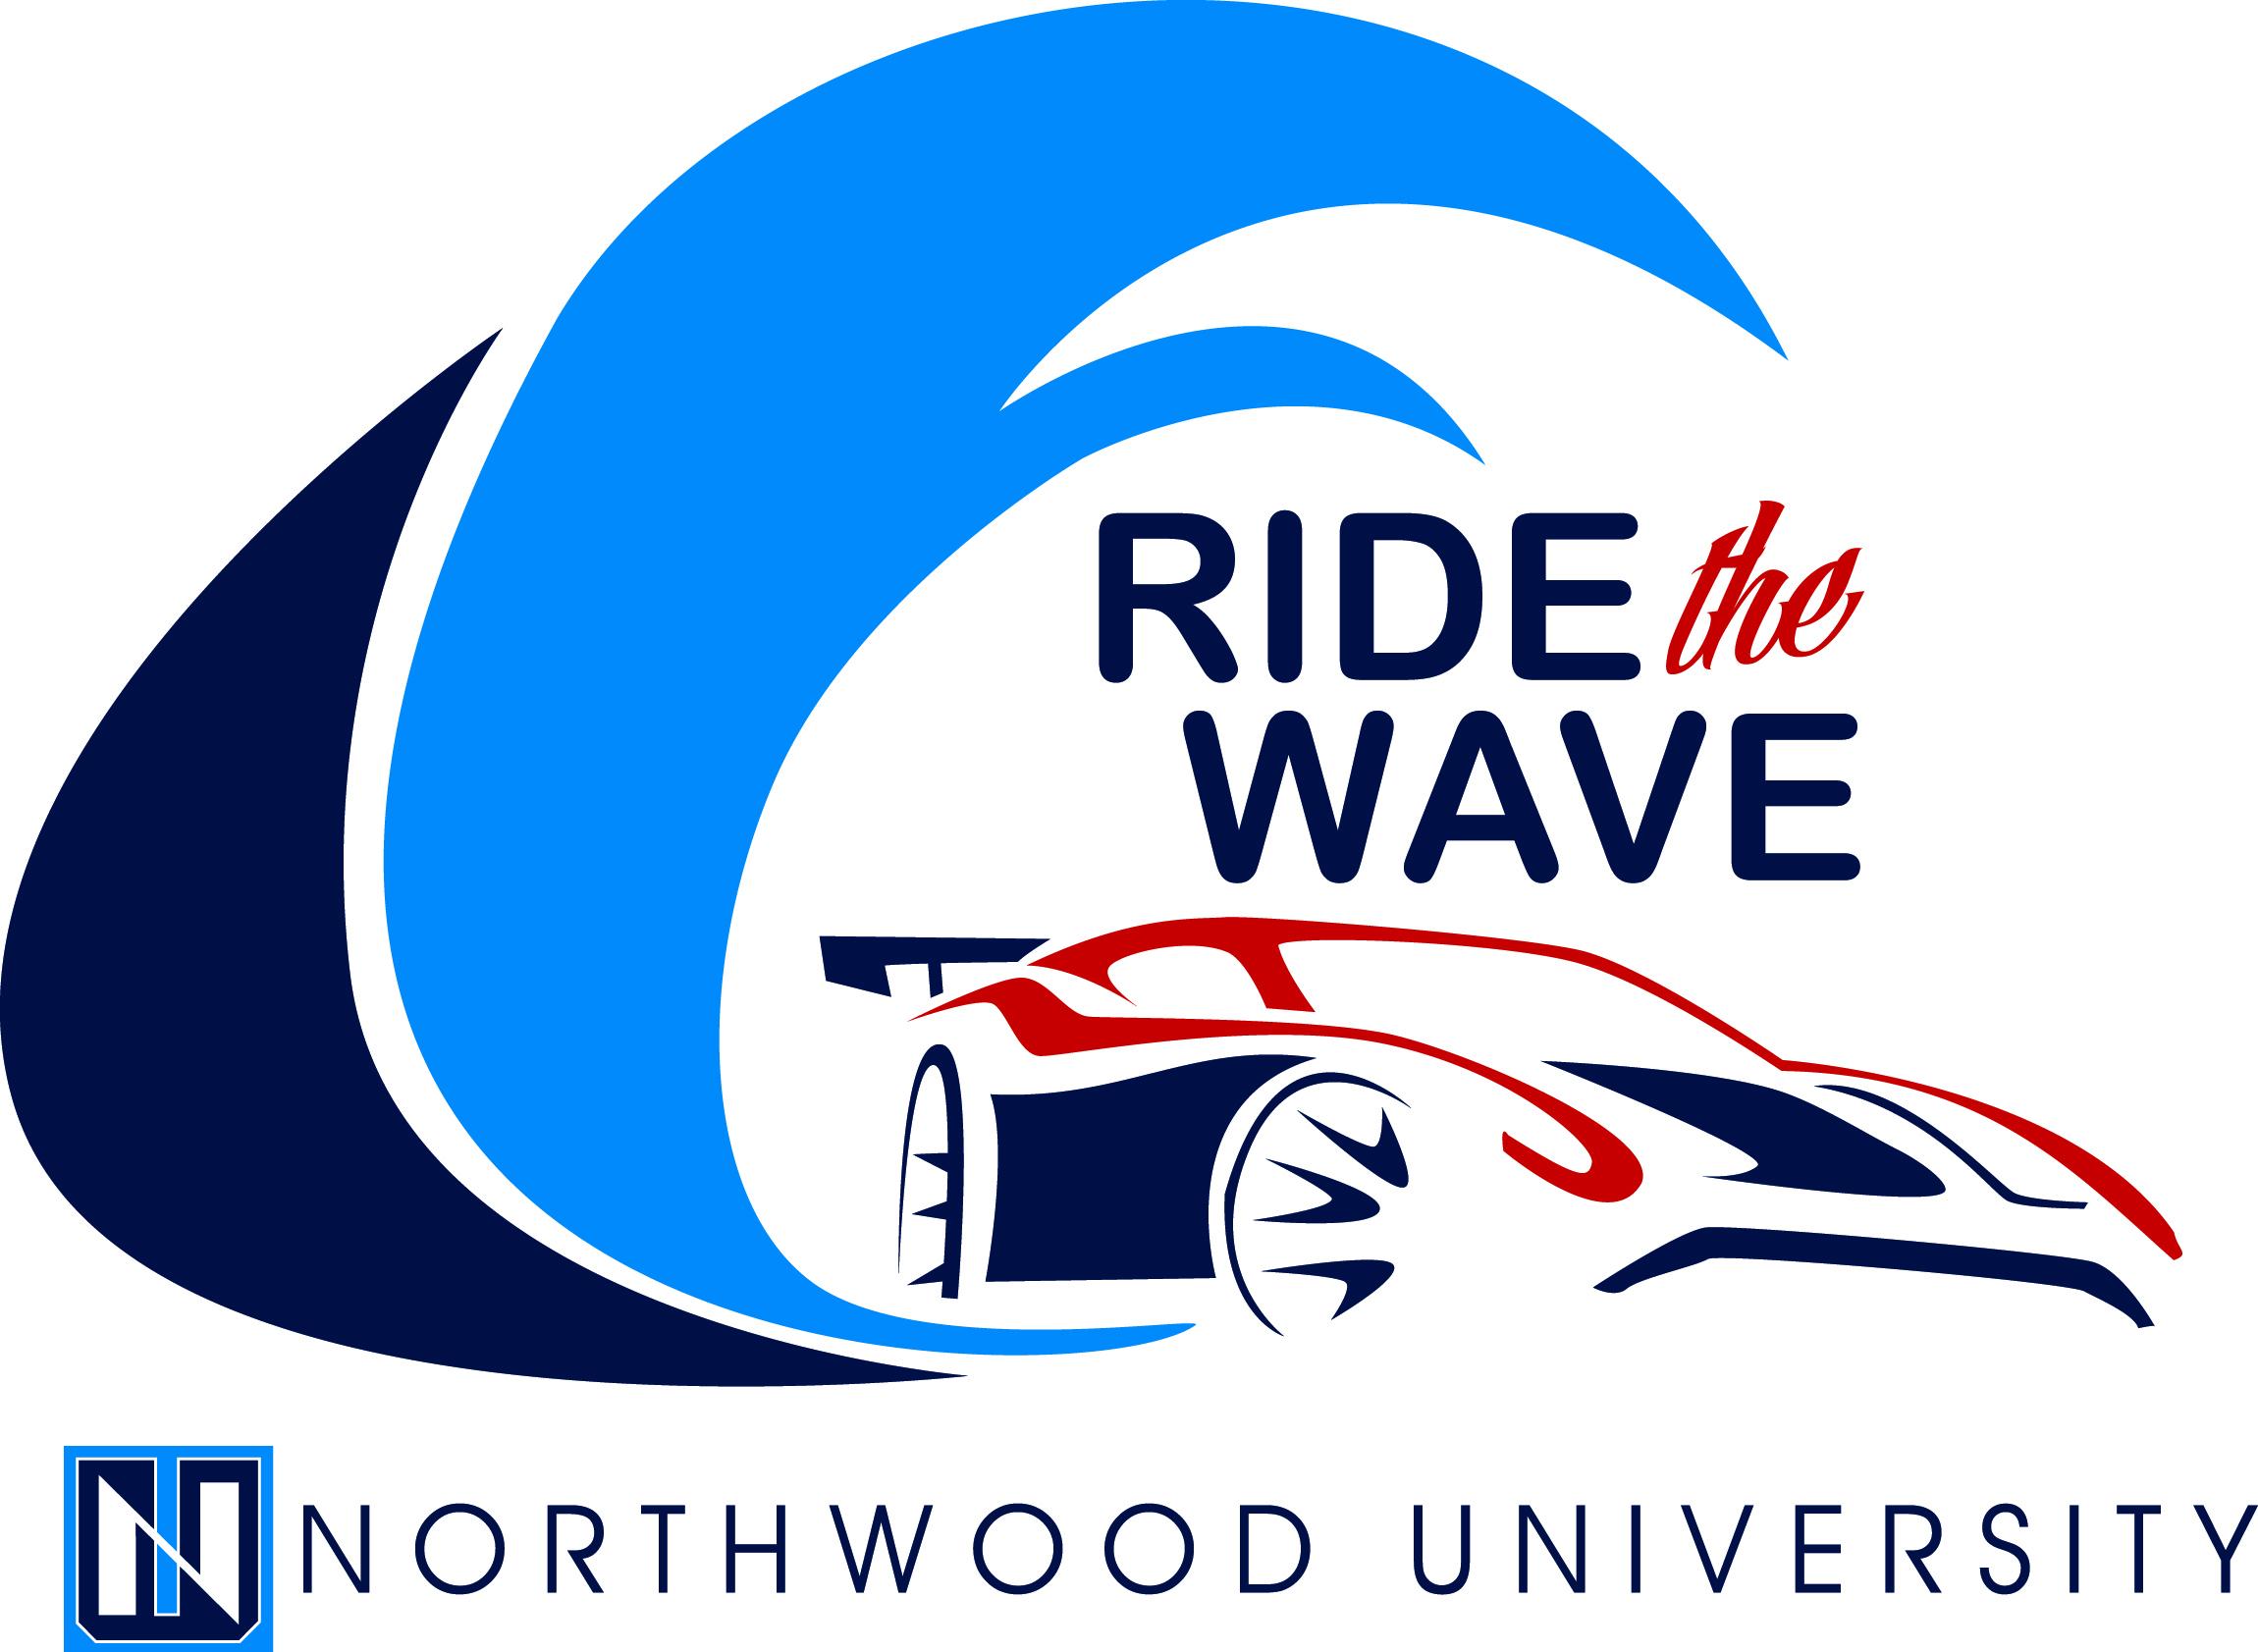 Auto-Show-RIDE-THE-WAVE-Theme-Logo-2-2015-1.jpg